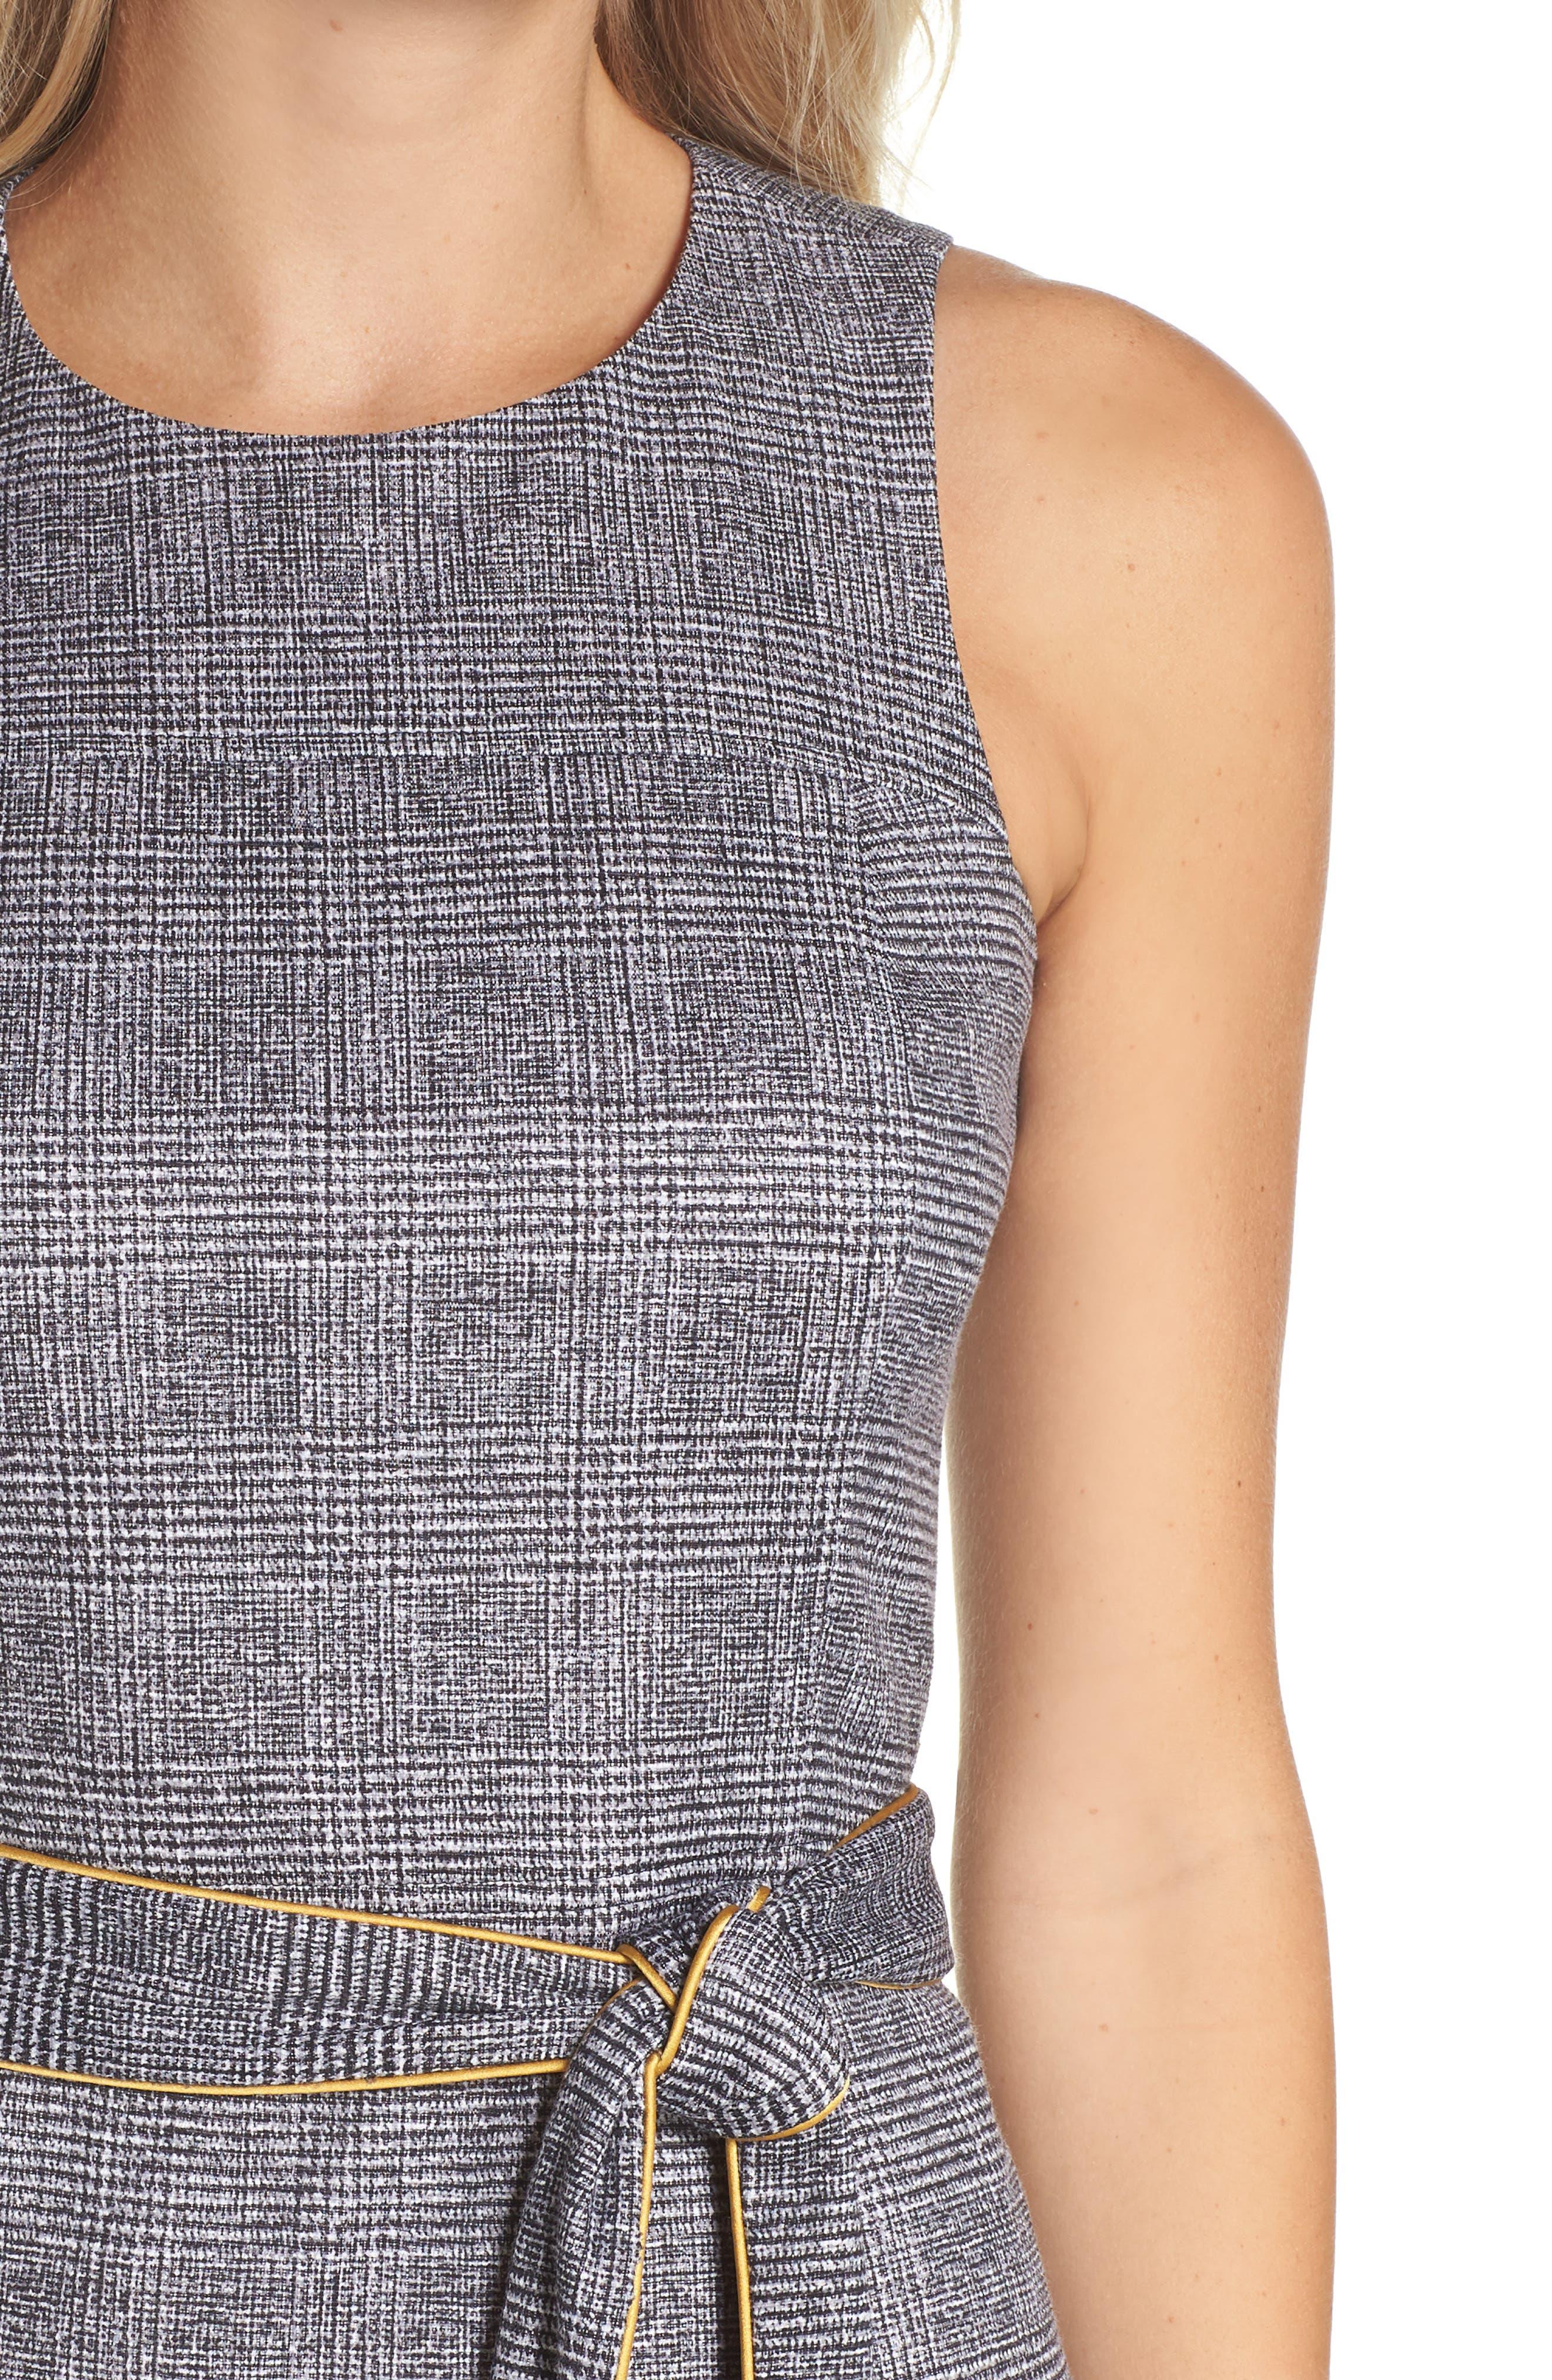 CHELSEA28,                             Sleeveless Plaid Dress,                             Alternate thumbnail 4, color,                             001